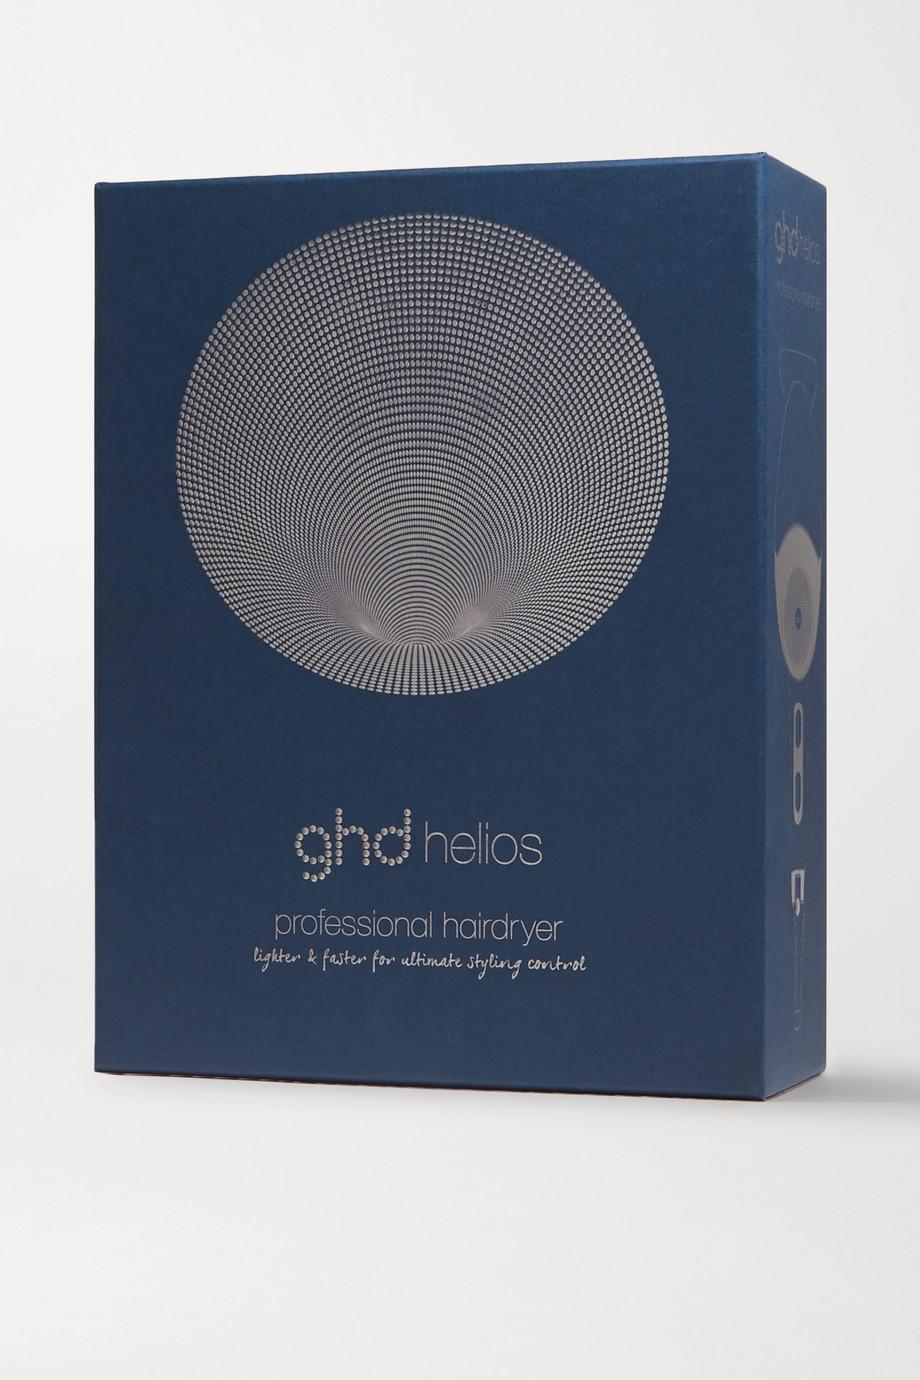 ghd Helios Professional Hair Dryer - US 2-pin plug